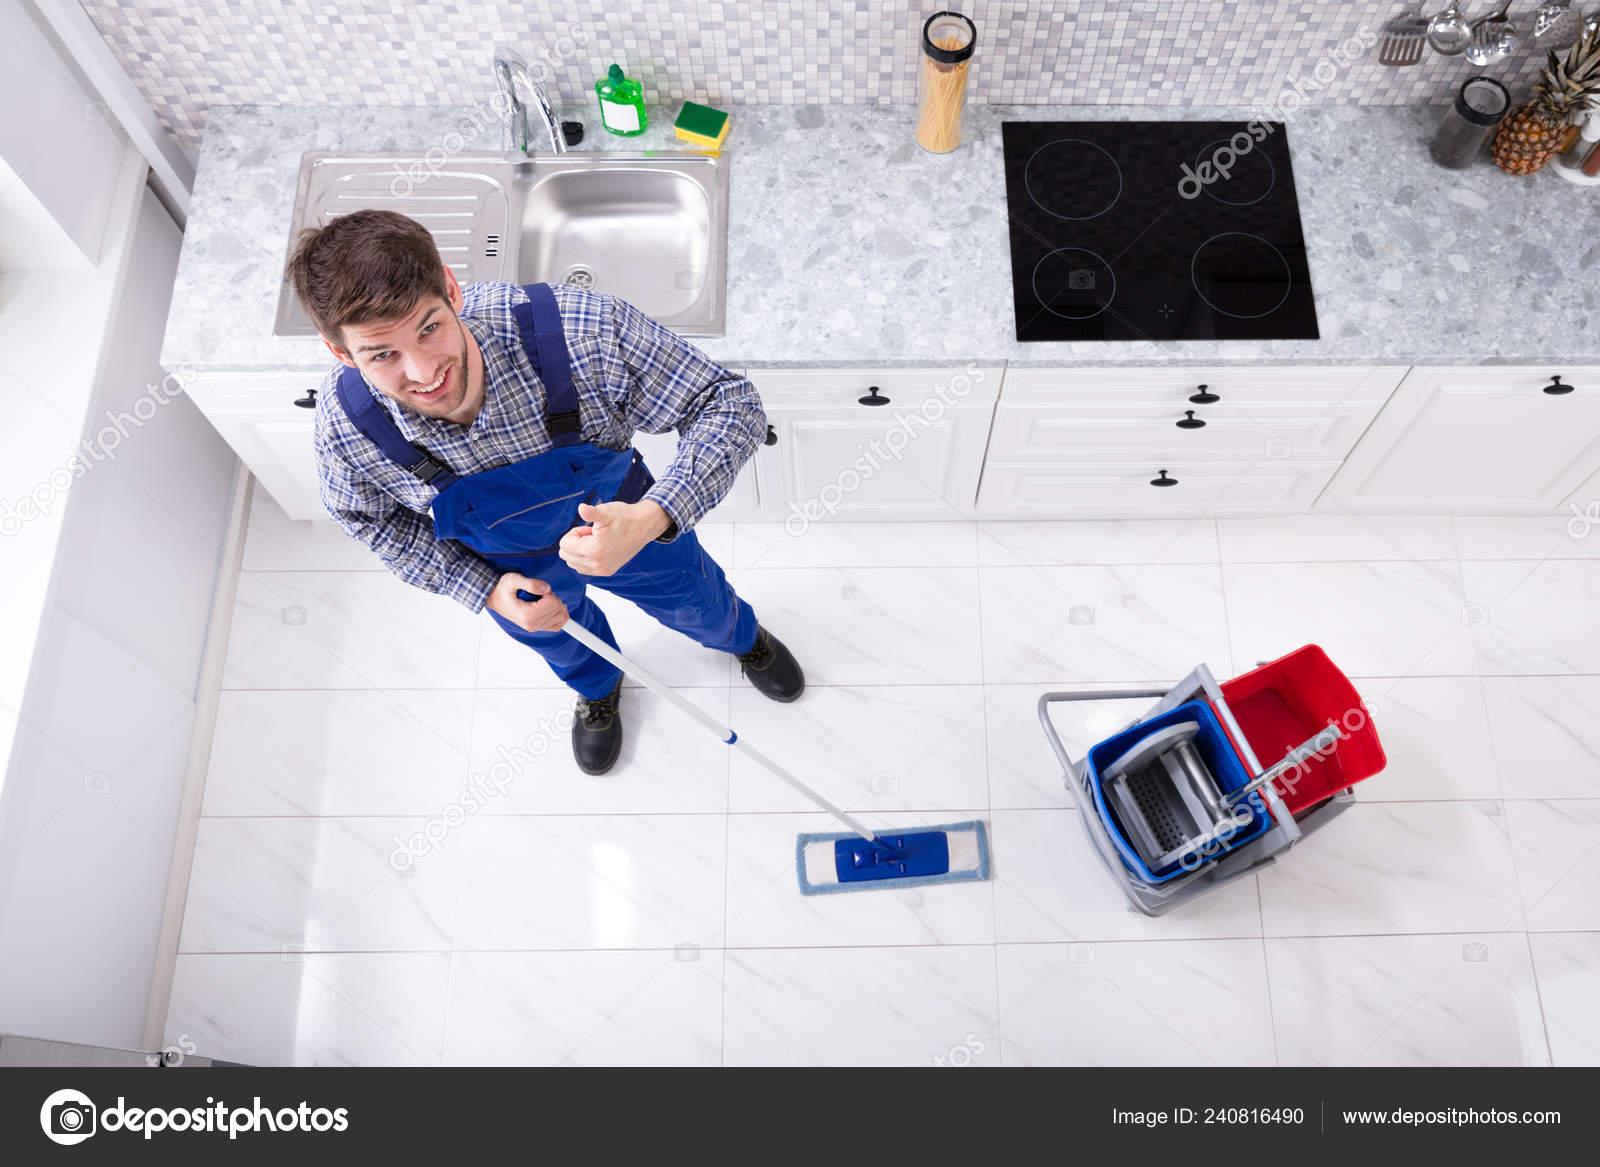 1e74bb741842 Μεγάλη Γωνία Προβολής Των Θυρωρών Που Καθαρίζουν Πάτωμα Σφουγγαρίστρα Στην  — Φωτογραφία Αρχείου